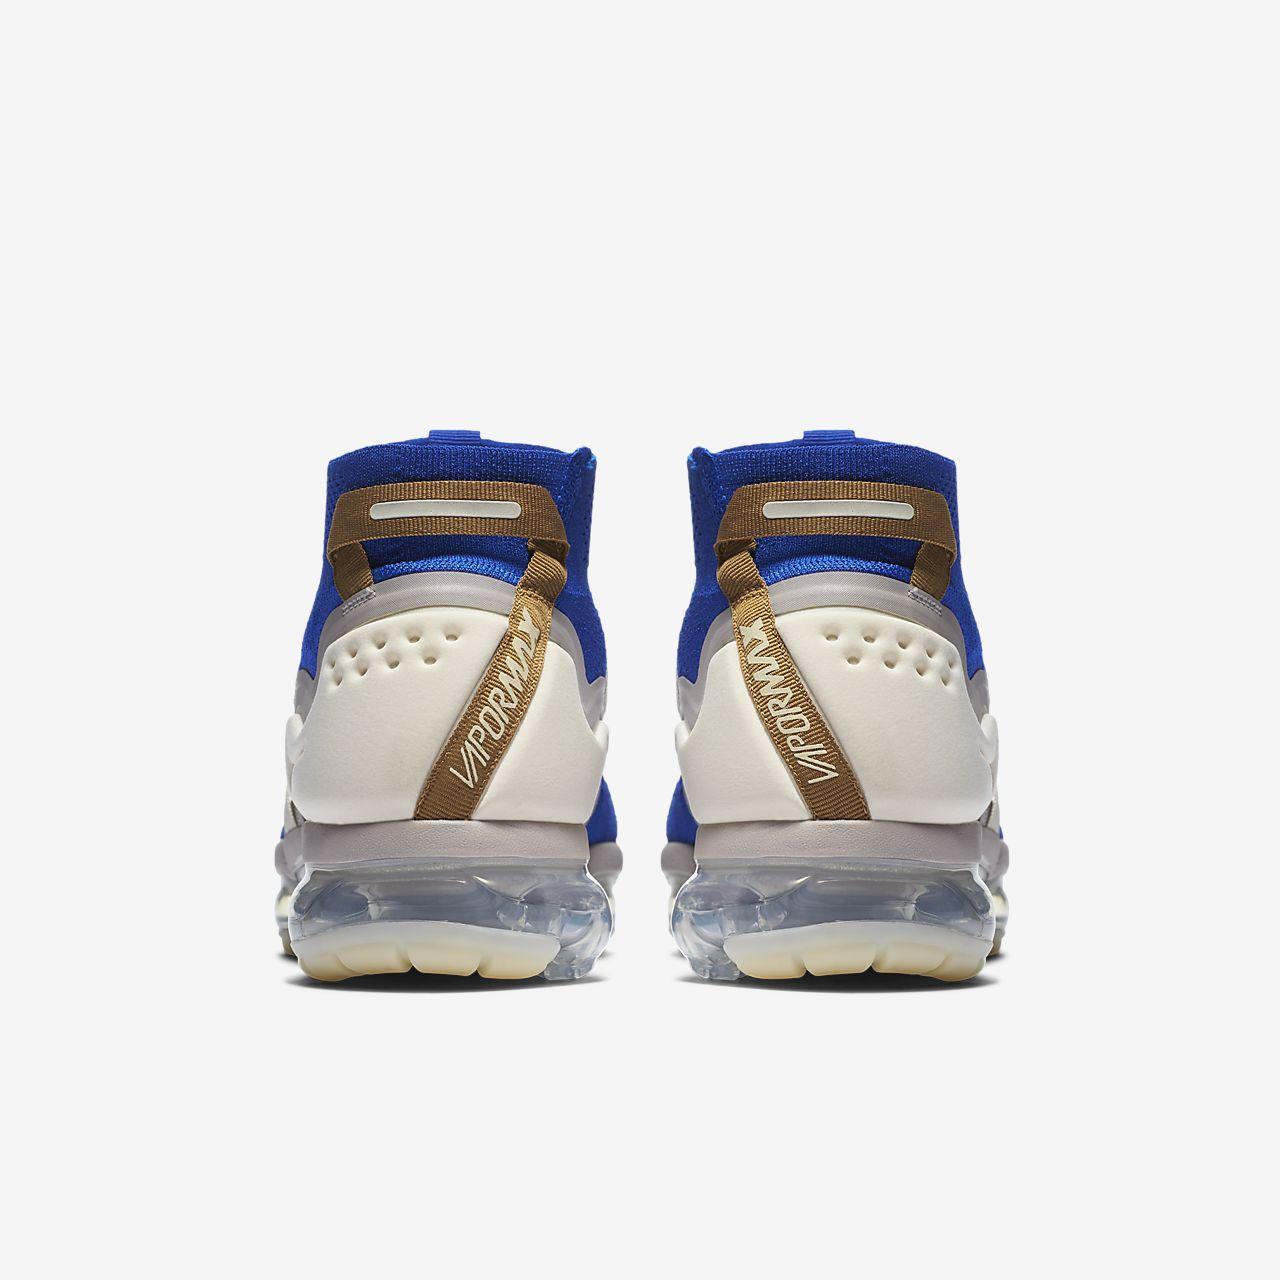 Nike Air VaporMax Flyknit Utility sko